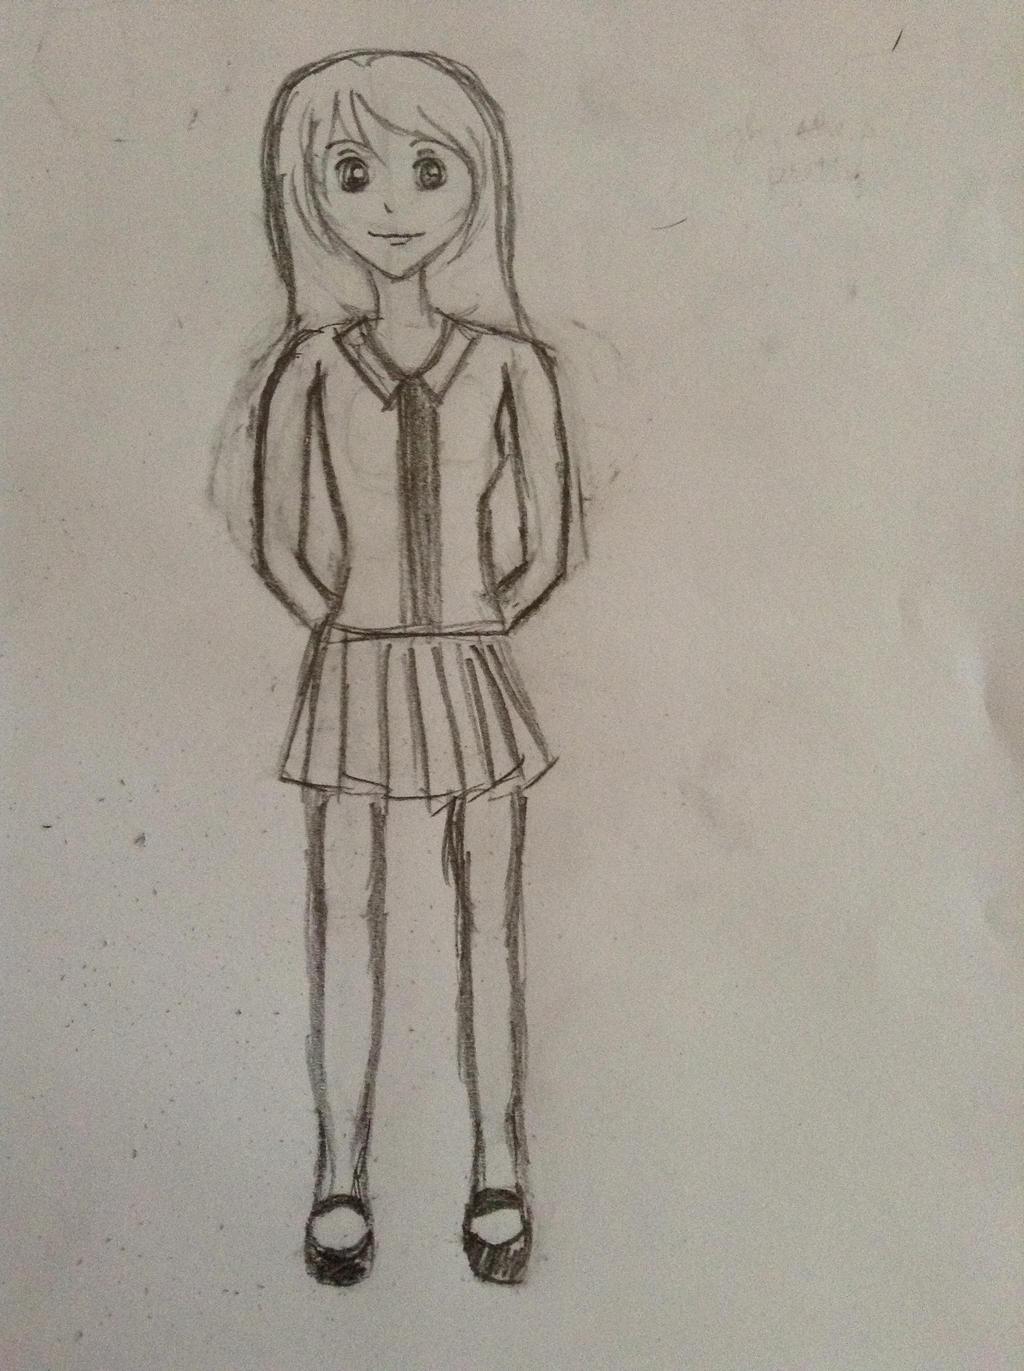 Anime Girl (full Body) (edited) By HotaruYoko On DeviantArt